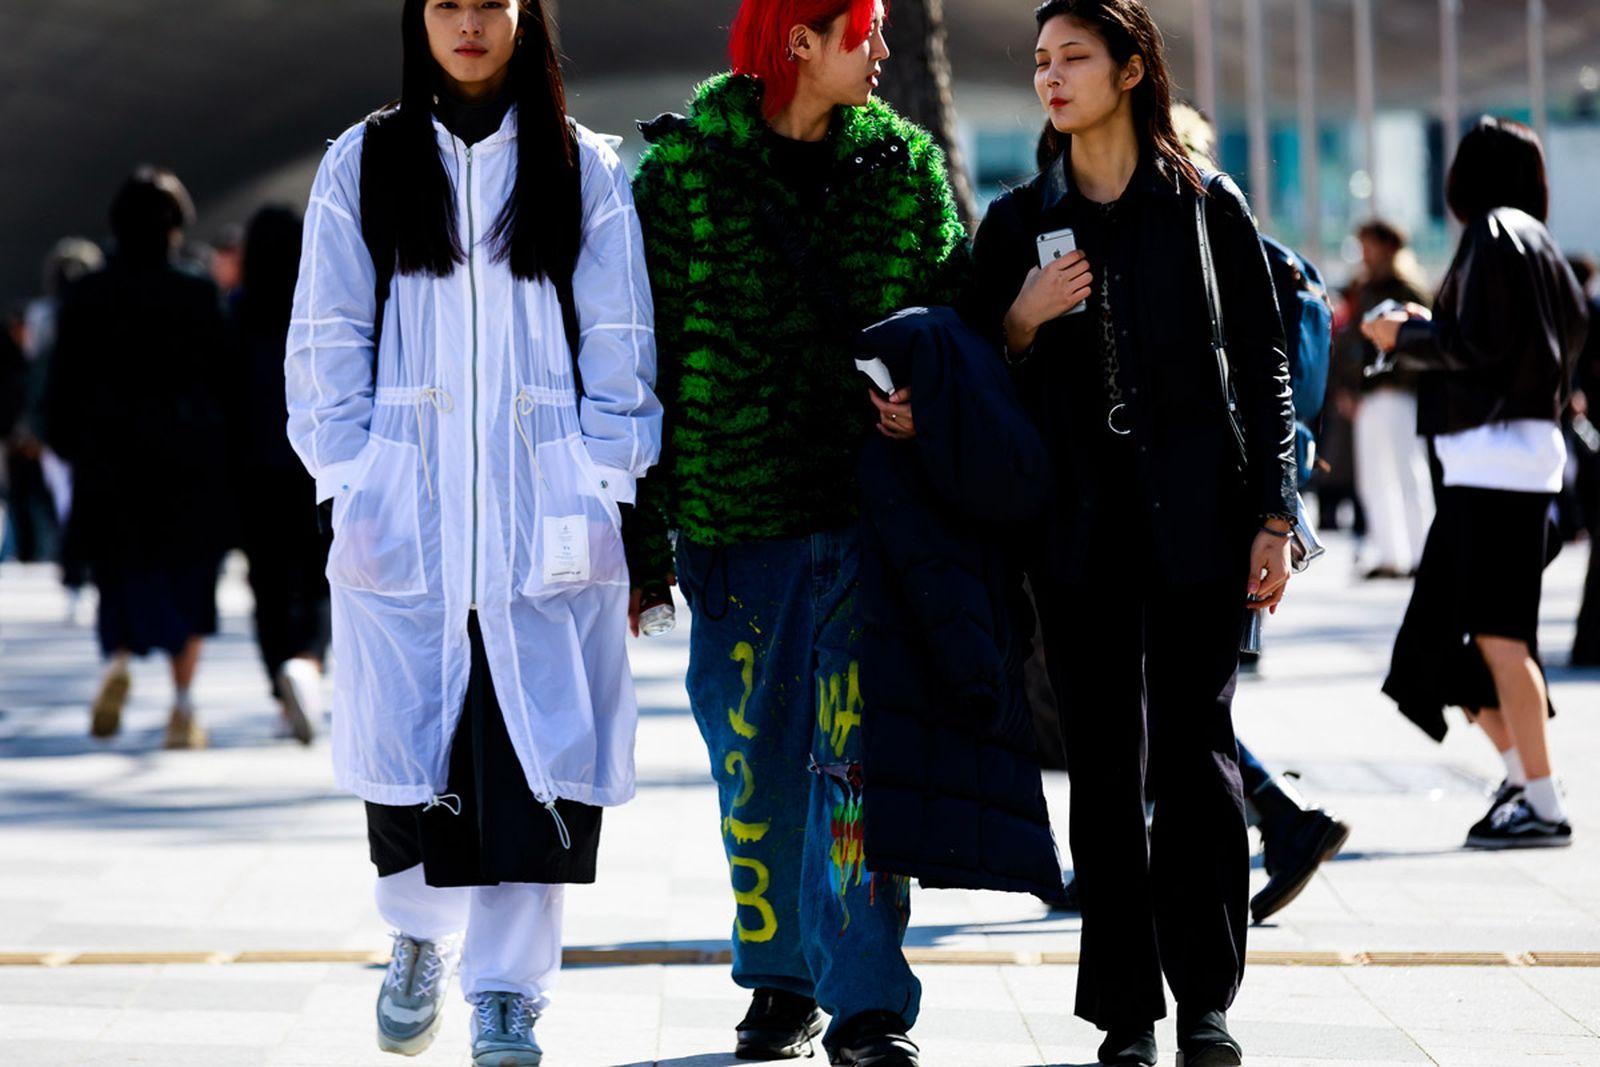 17Seoul street style march paul jeong seoul fashion week